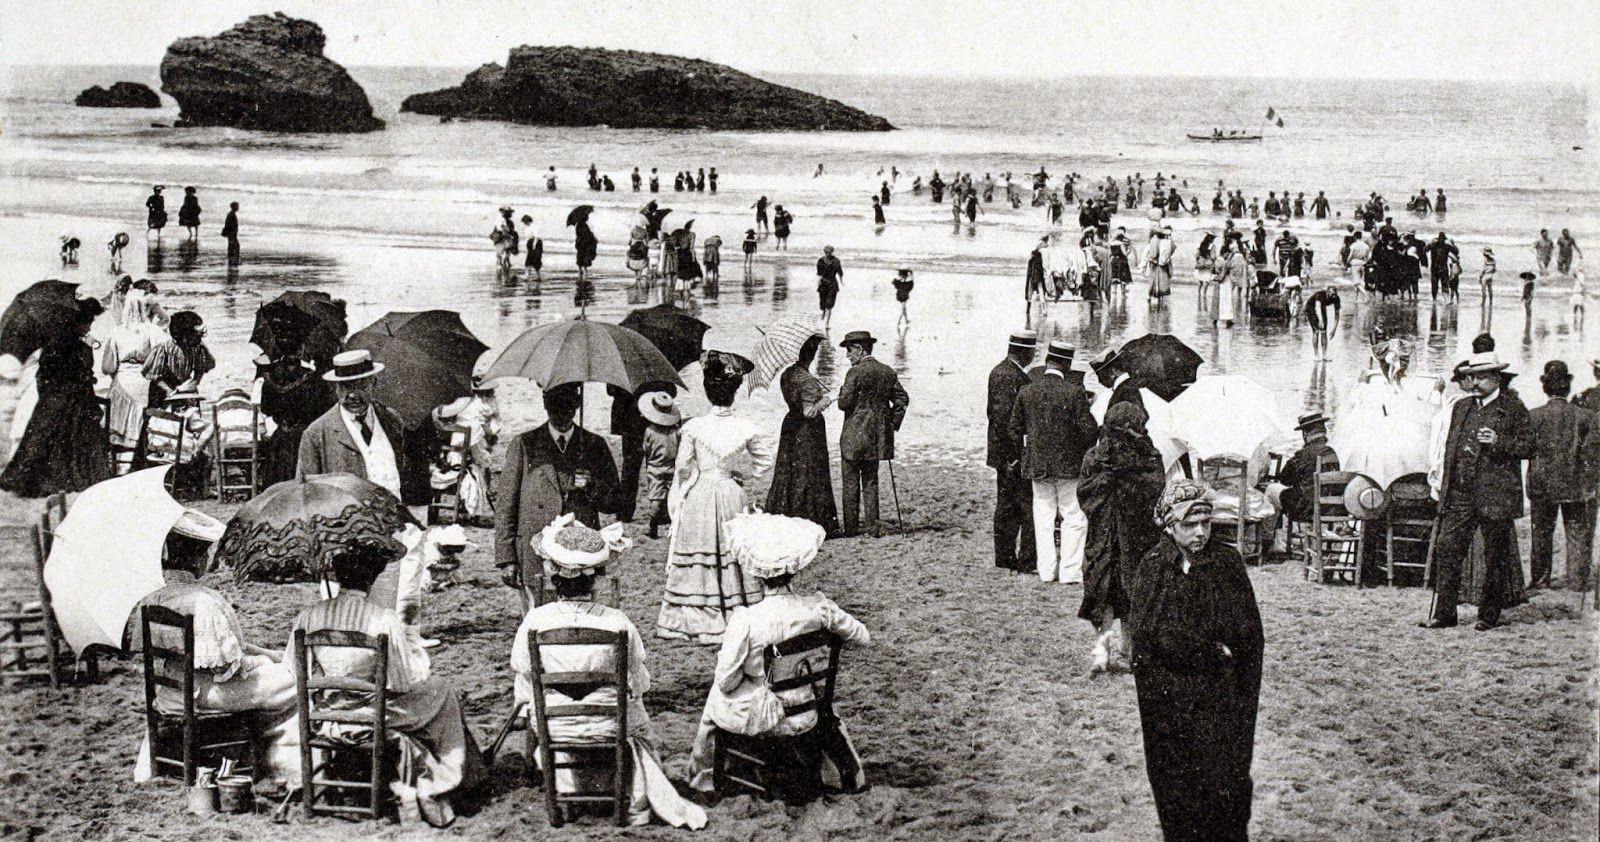 Bains 1900